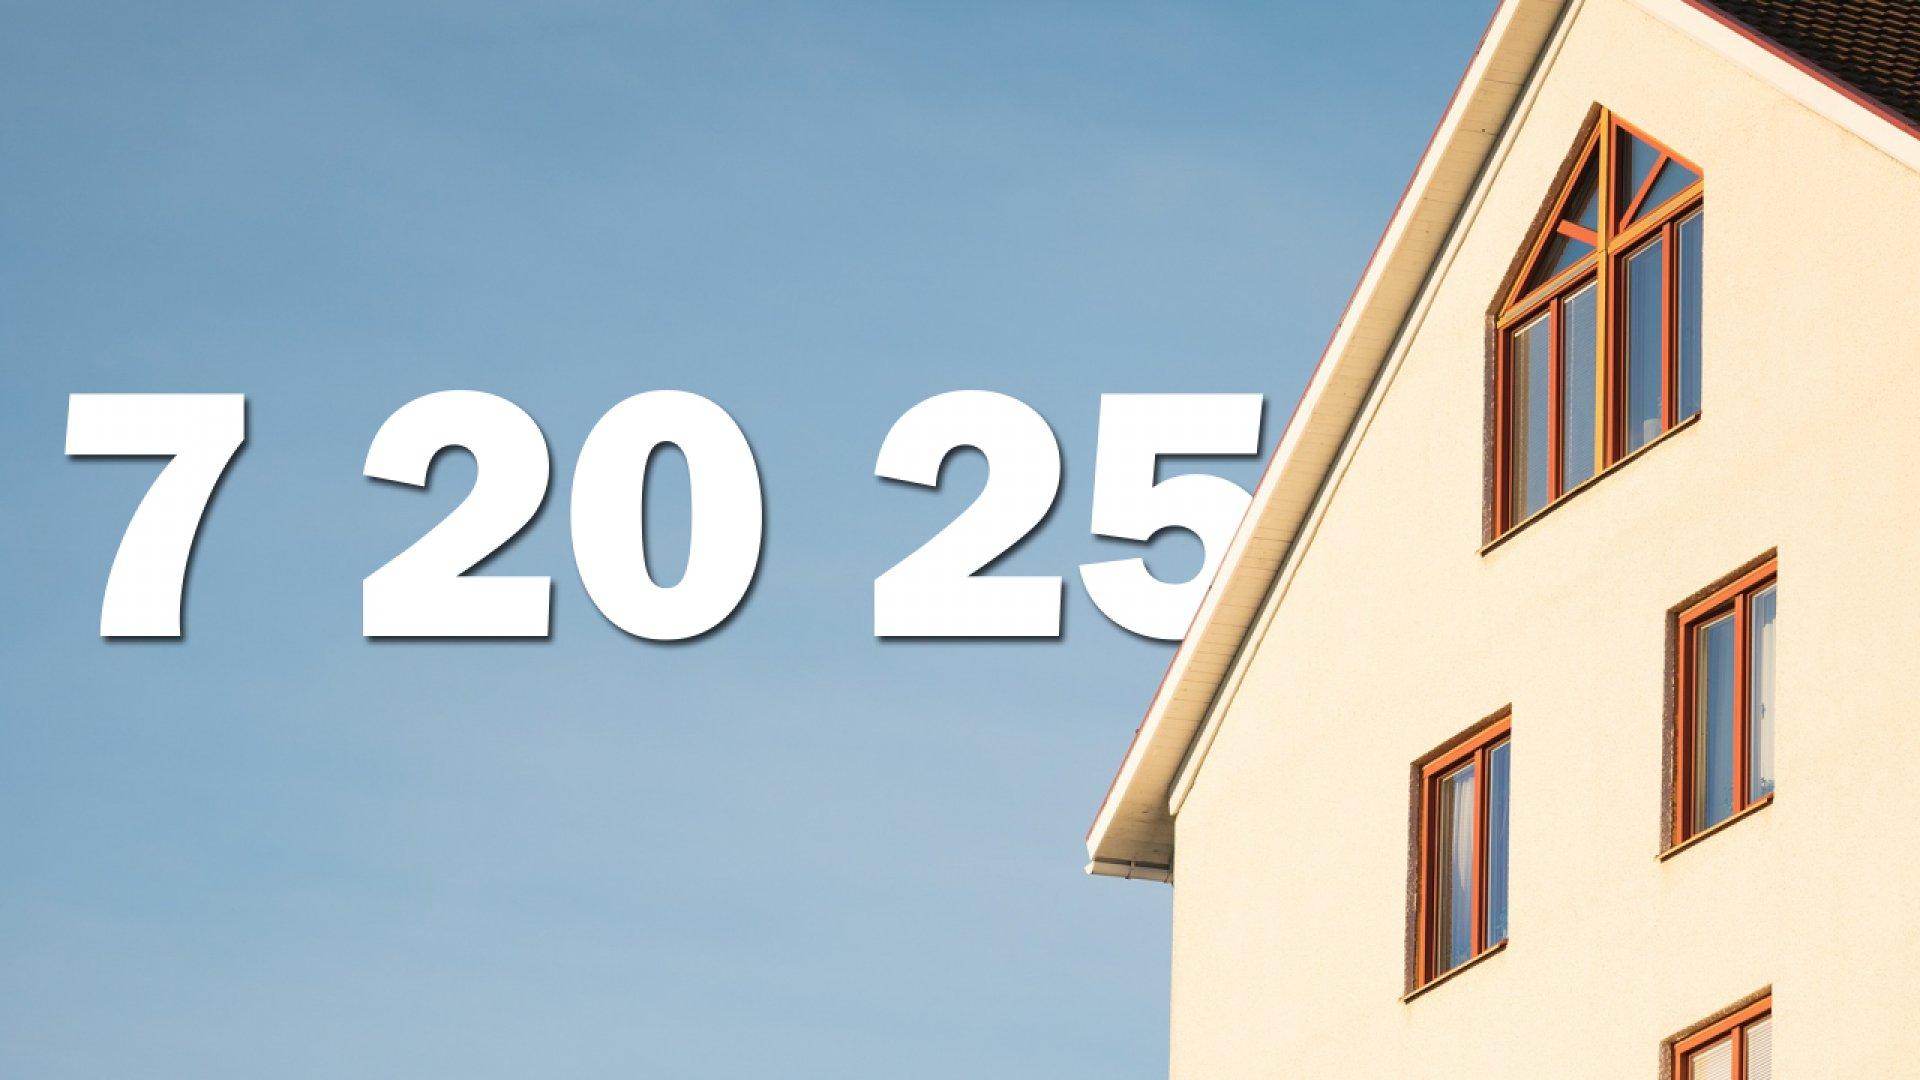 Банк центркредит 7 20 25